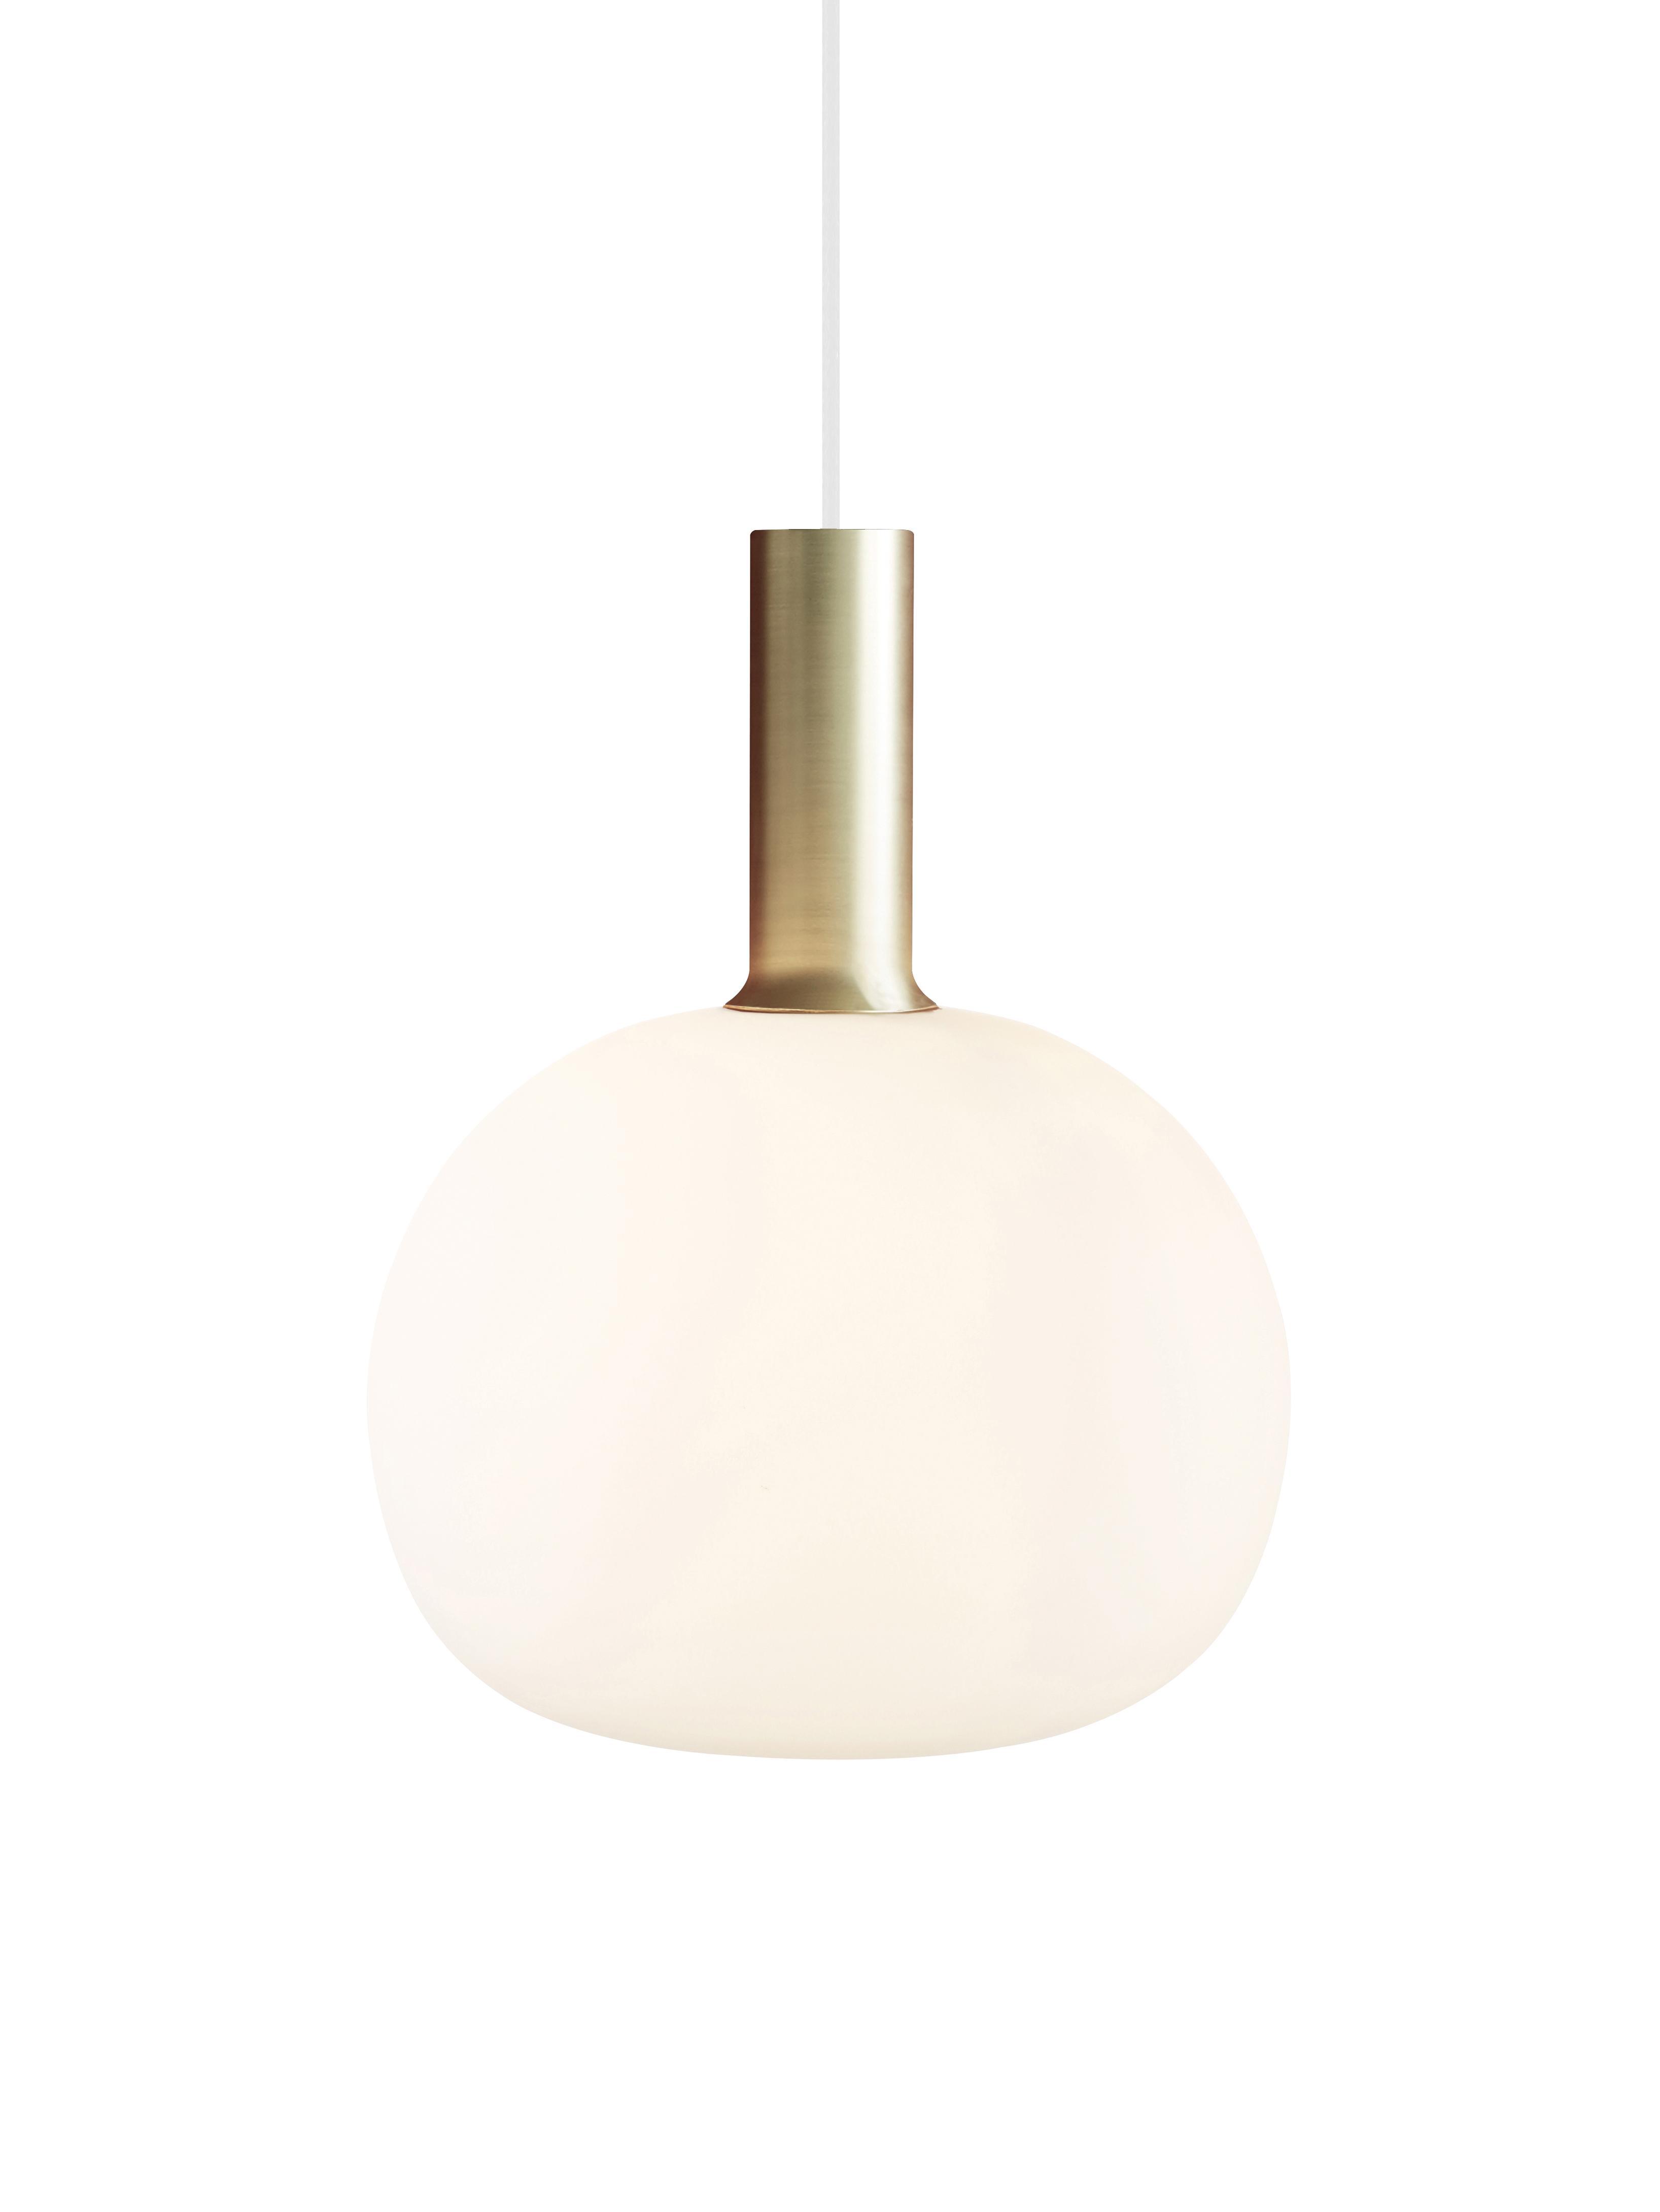 Hanglamp Alton van opaalglas, Diffuser: opaalglas, Messingkleurig, wit, Ø 25 x H 33 cm